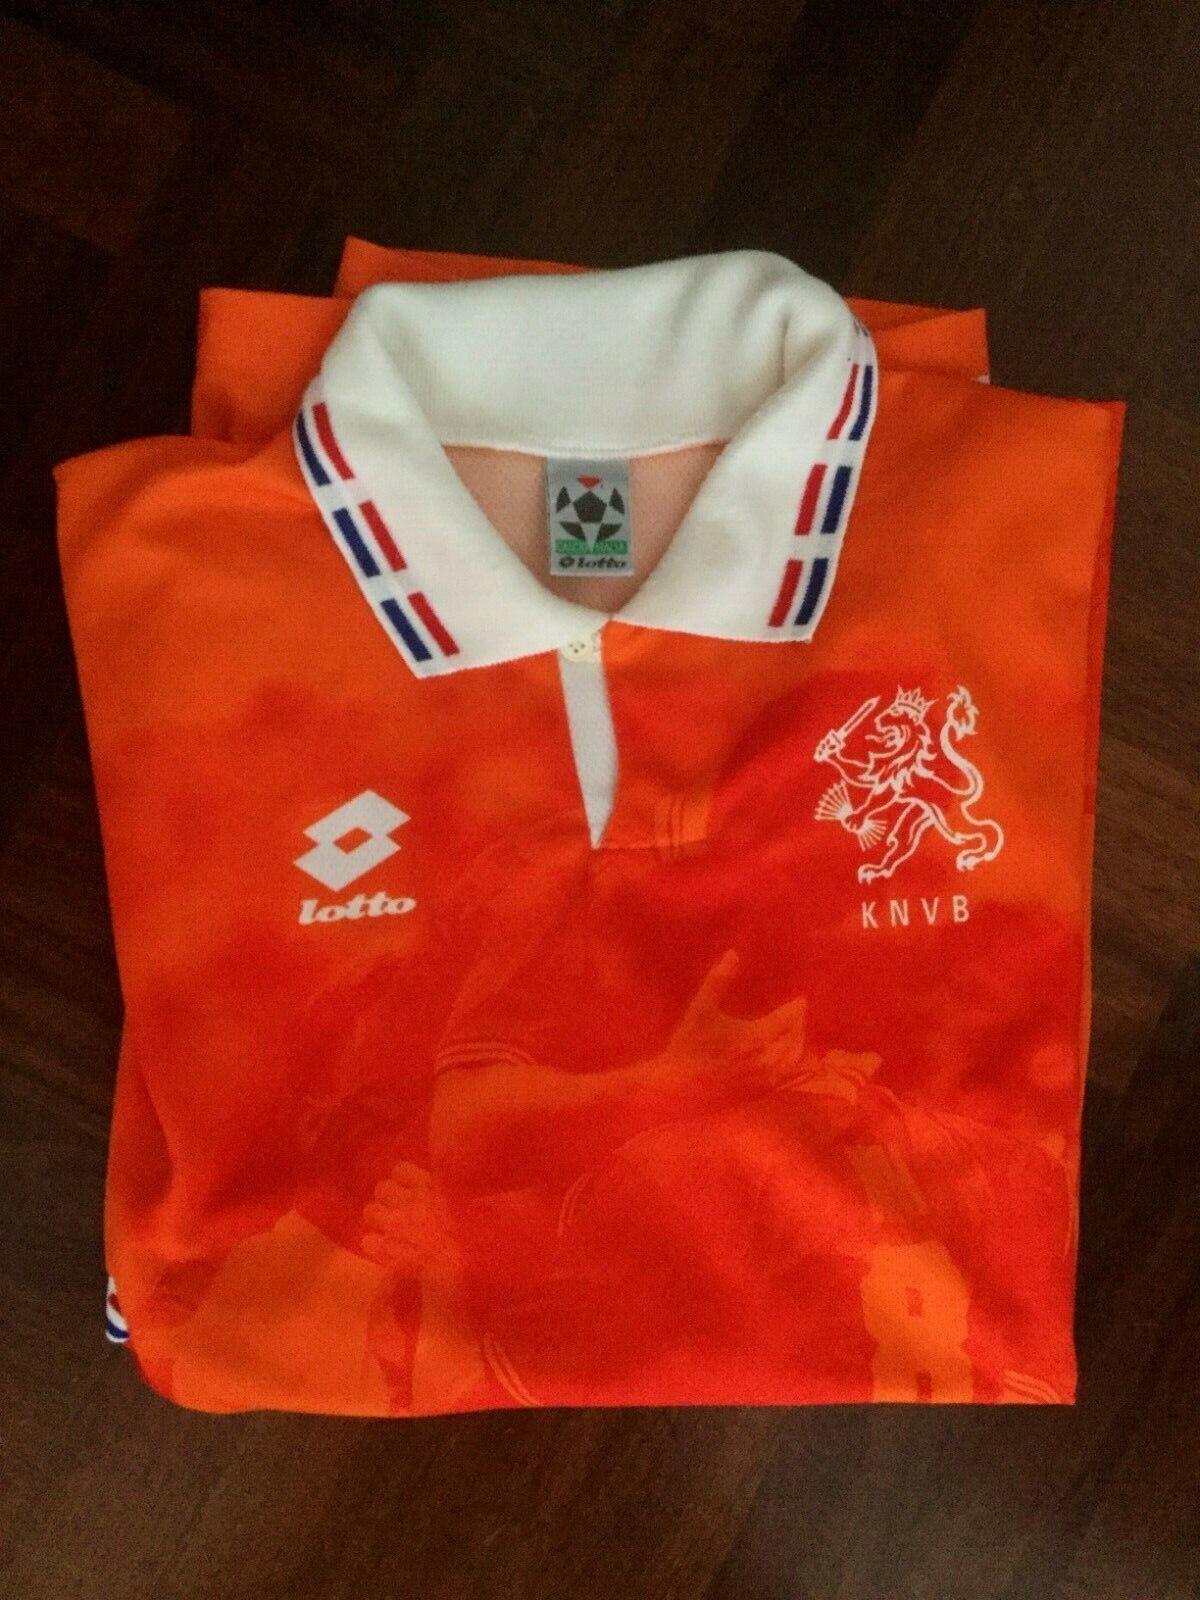 Maglia calcio lotto olanda netherland football shirt trikot vintage 1996 size XL